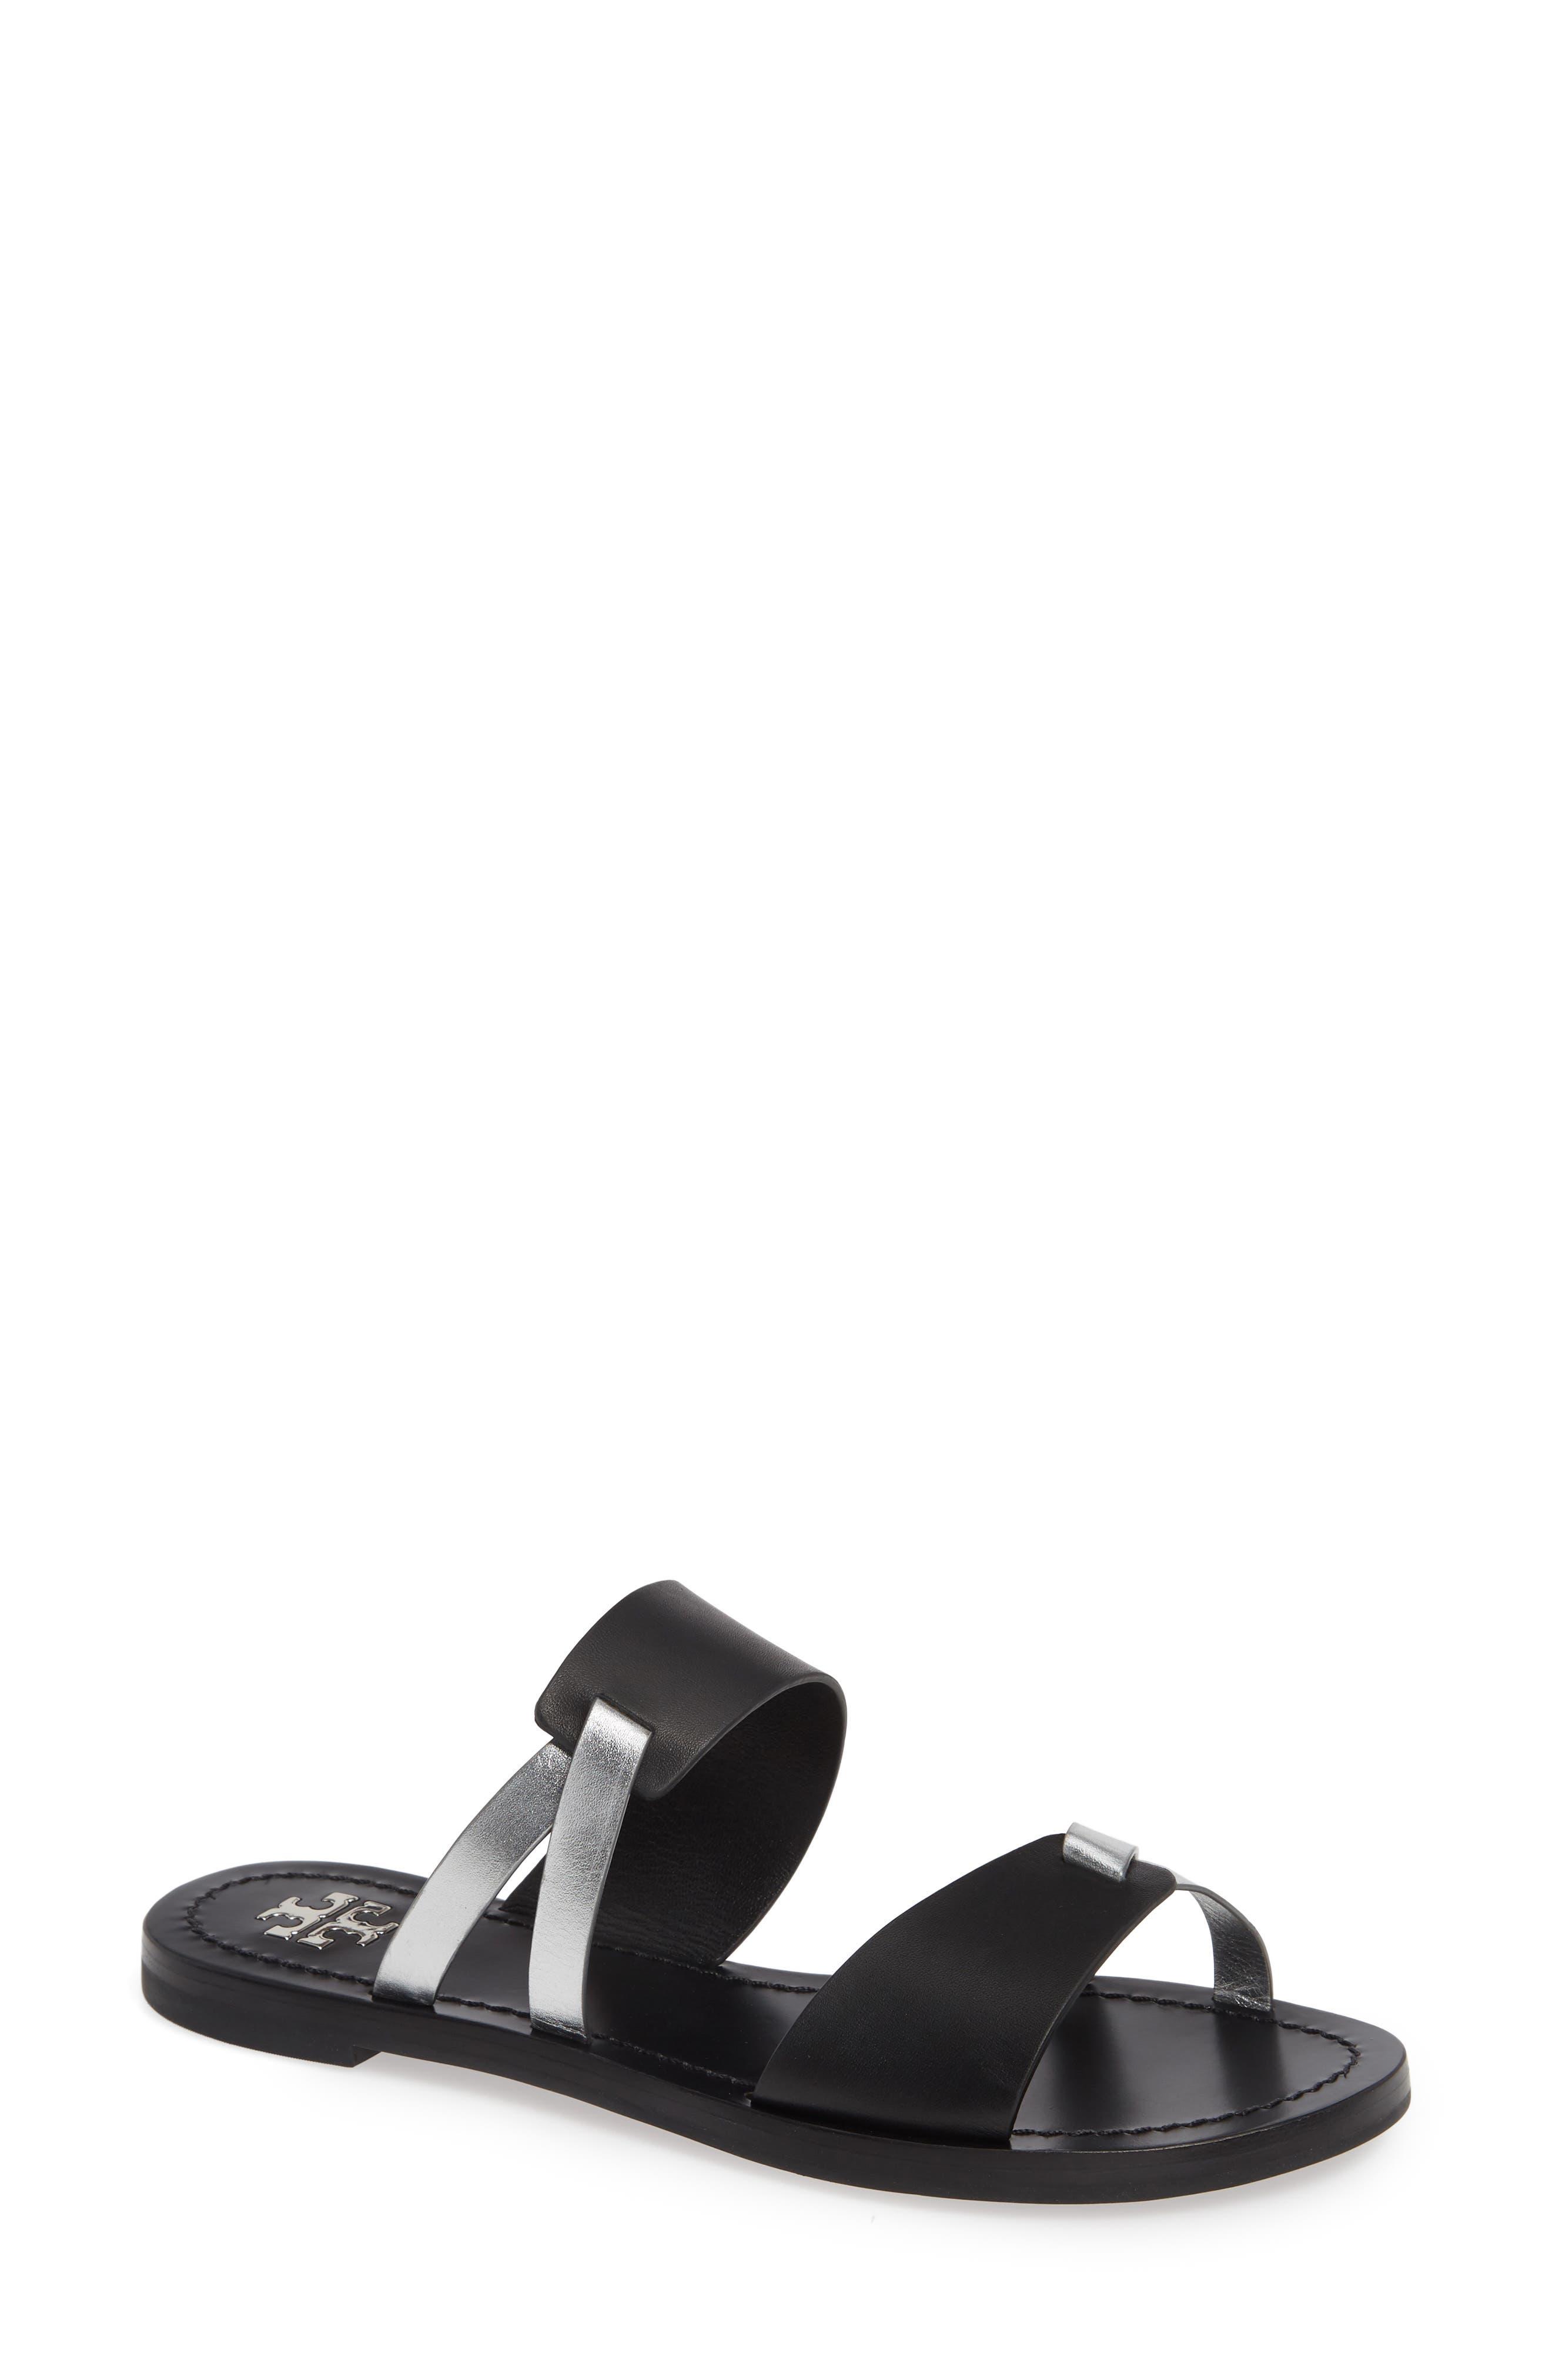 Tory Burch Ravello Double Band Slide Sandal, Metallic